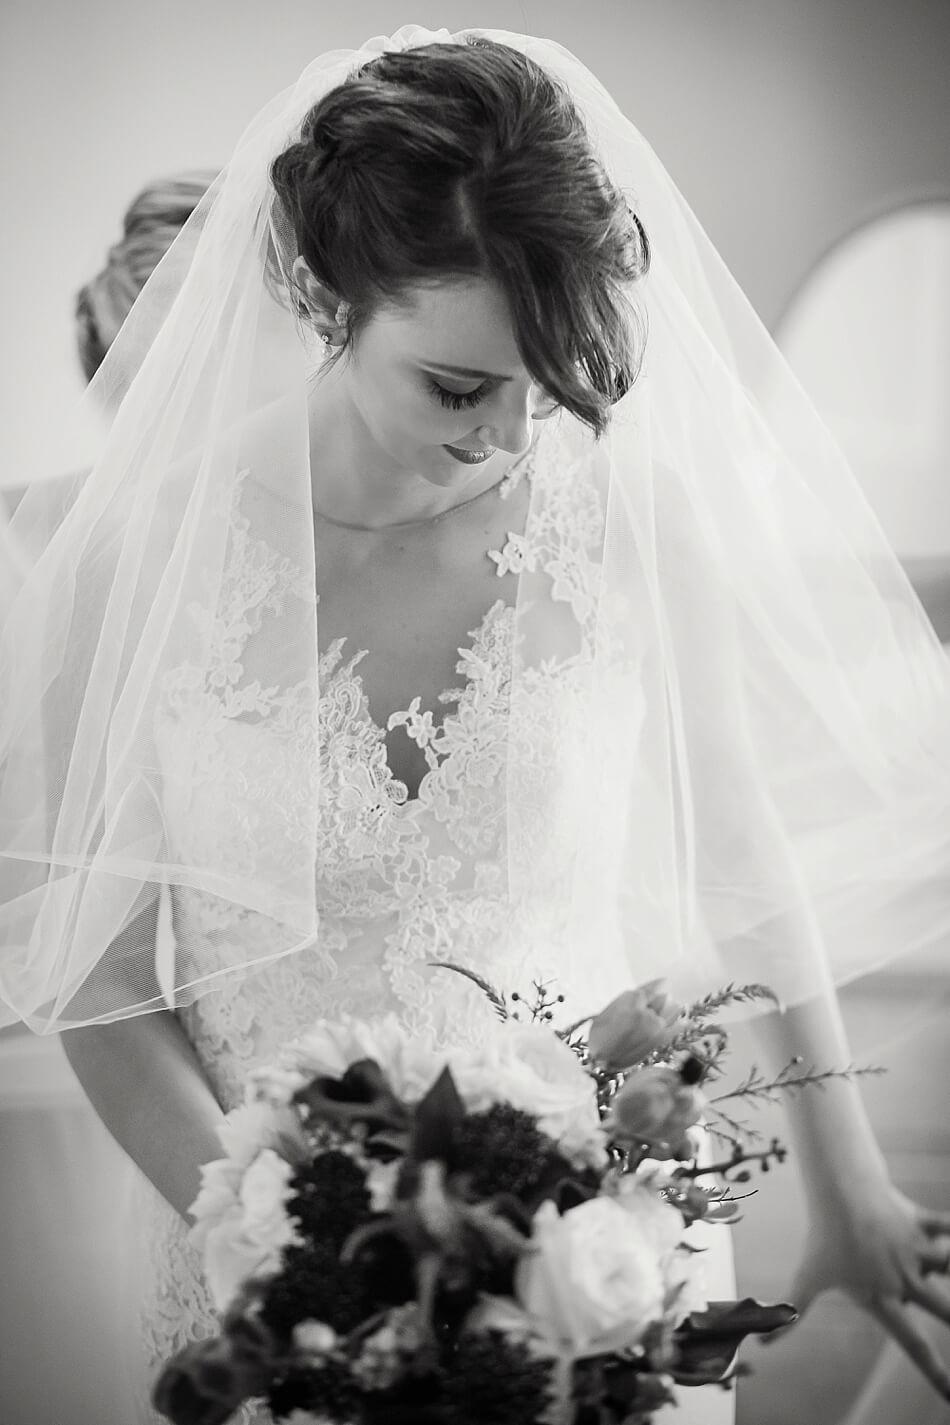 nikki-meyer_landtscap_stellenbosch_wedding_photographer_020